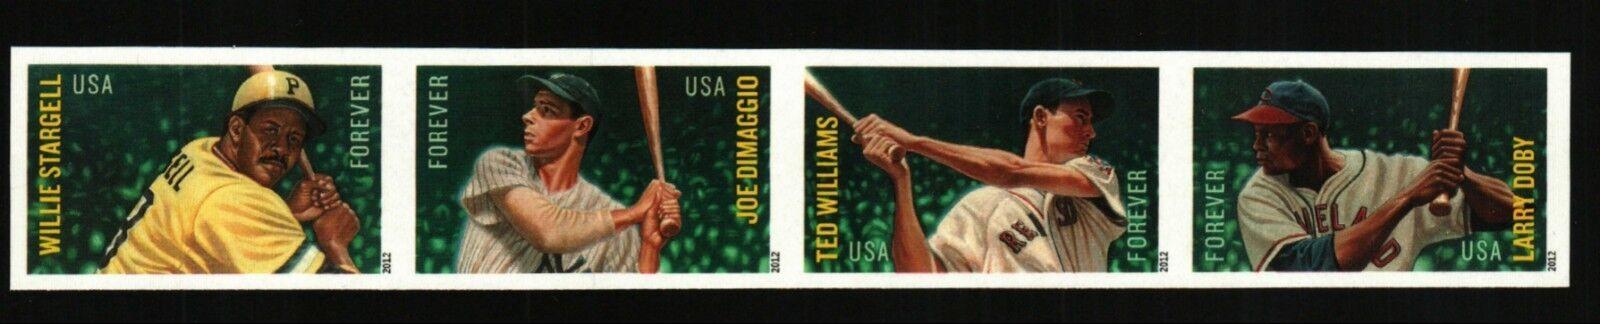 2012 45c Major League Baseball All-stars, Strip of 4 Sc